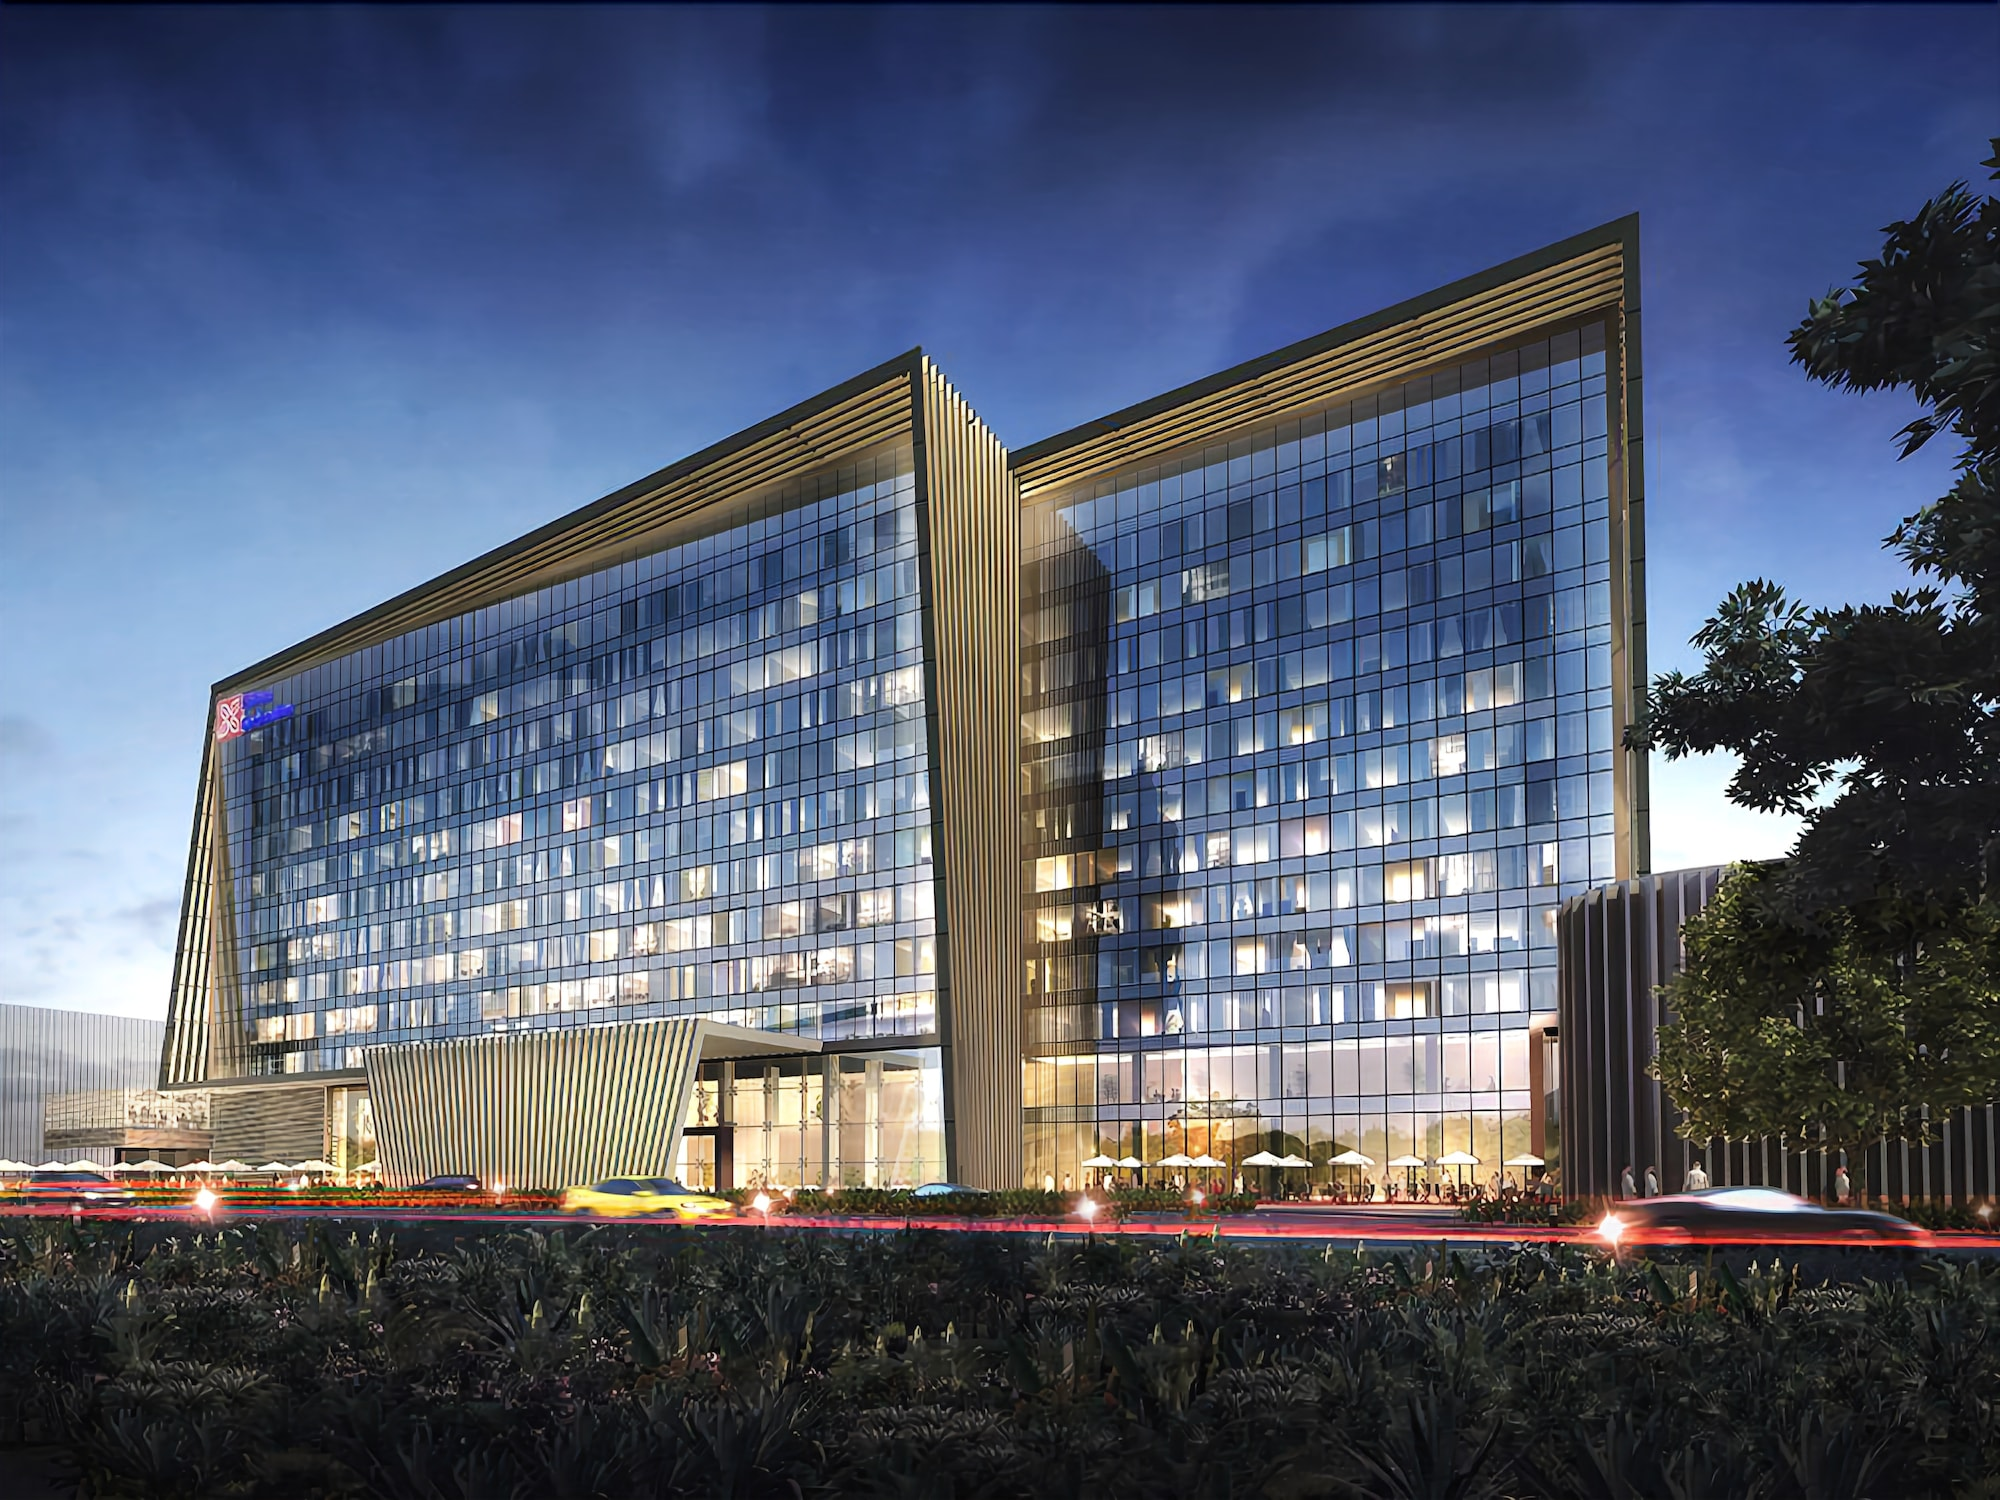 Hilton Garden Inn Kuwait City